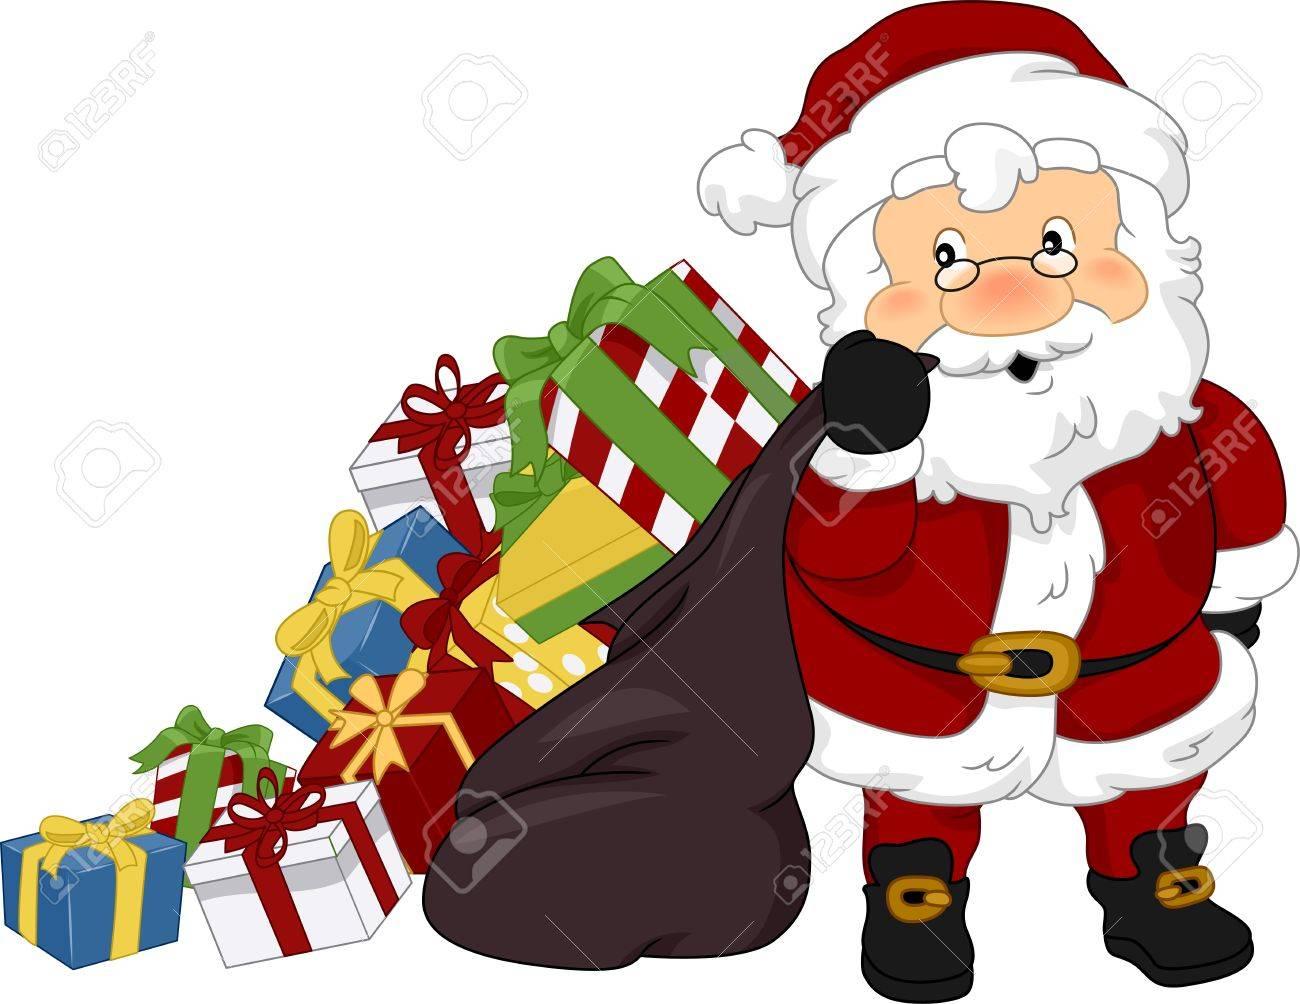 illustration illustration of santa claus carrying christmas presents - Santa Claus Presents